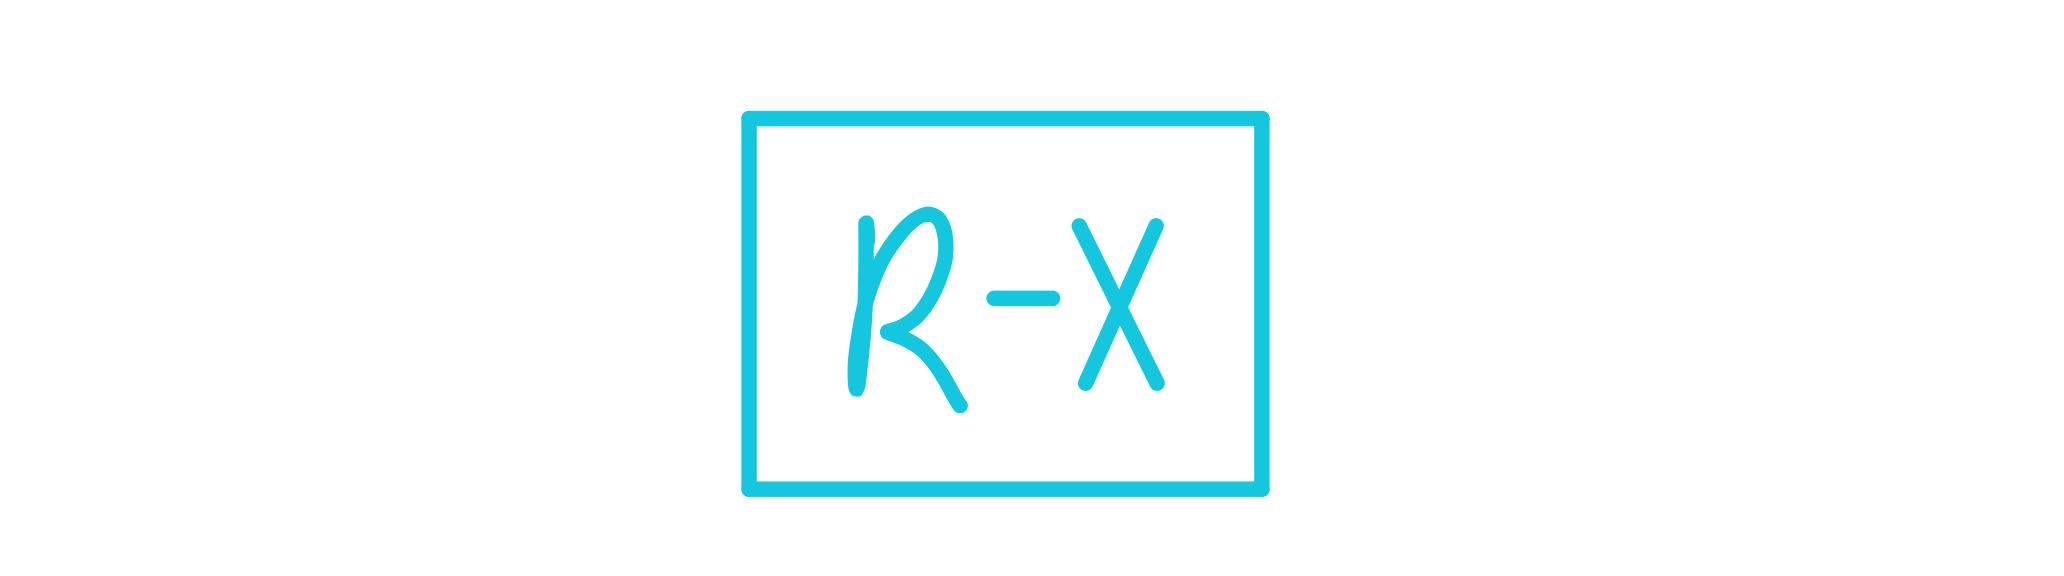 General formula of an alkyl halide